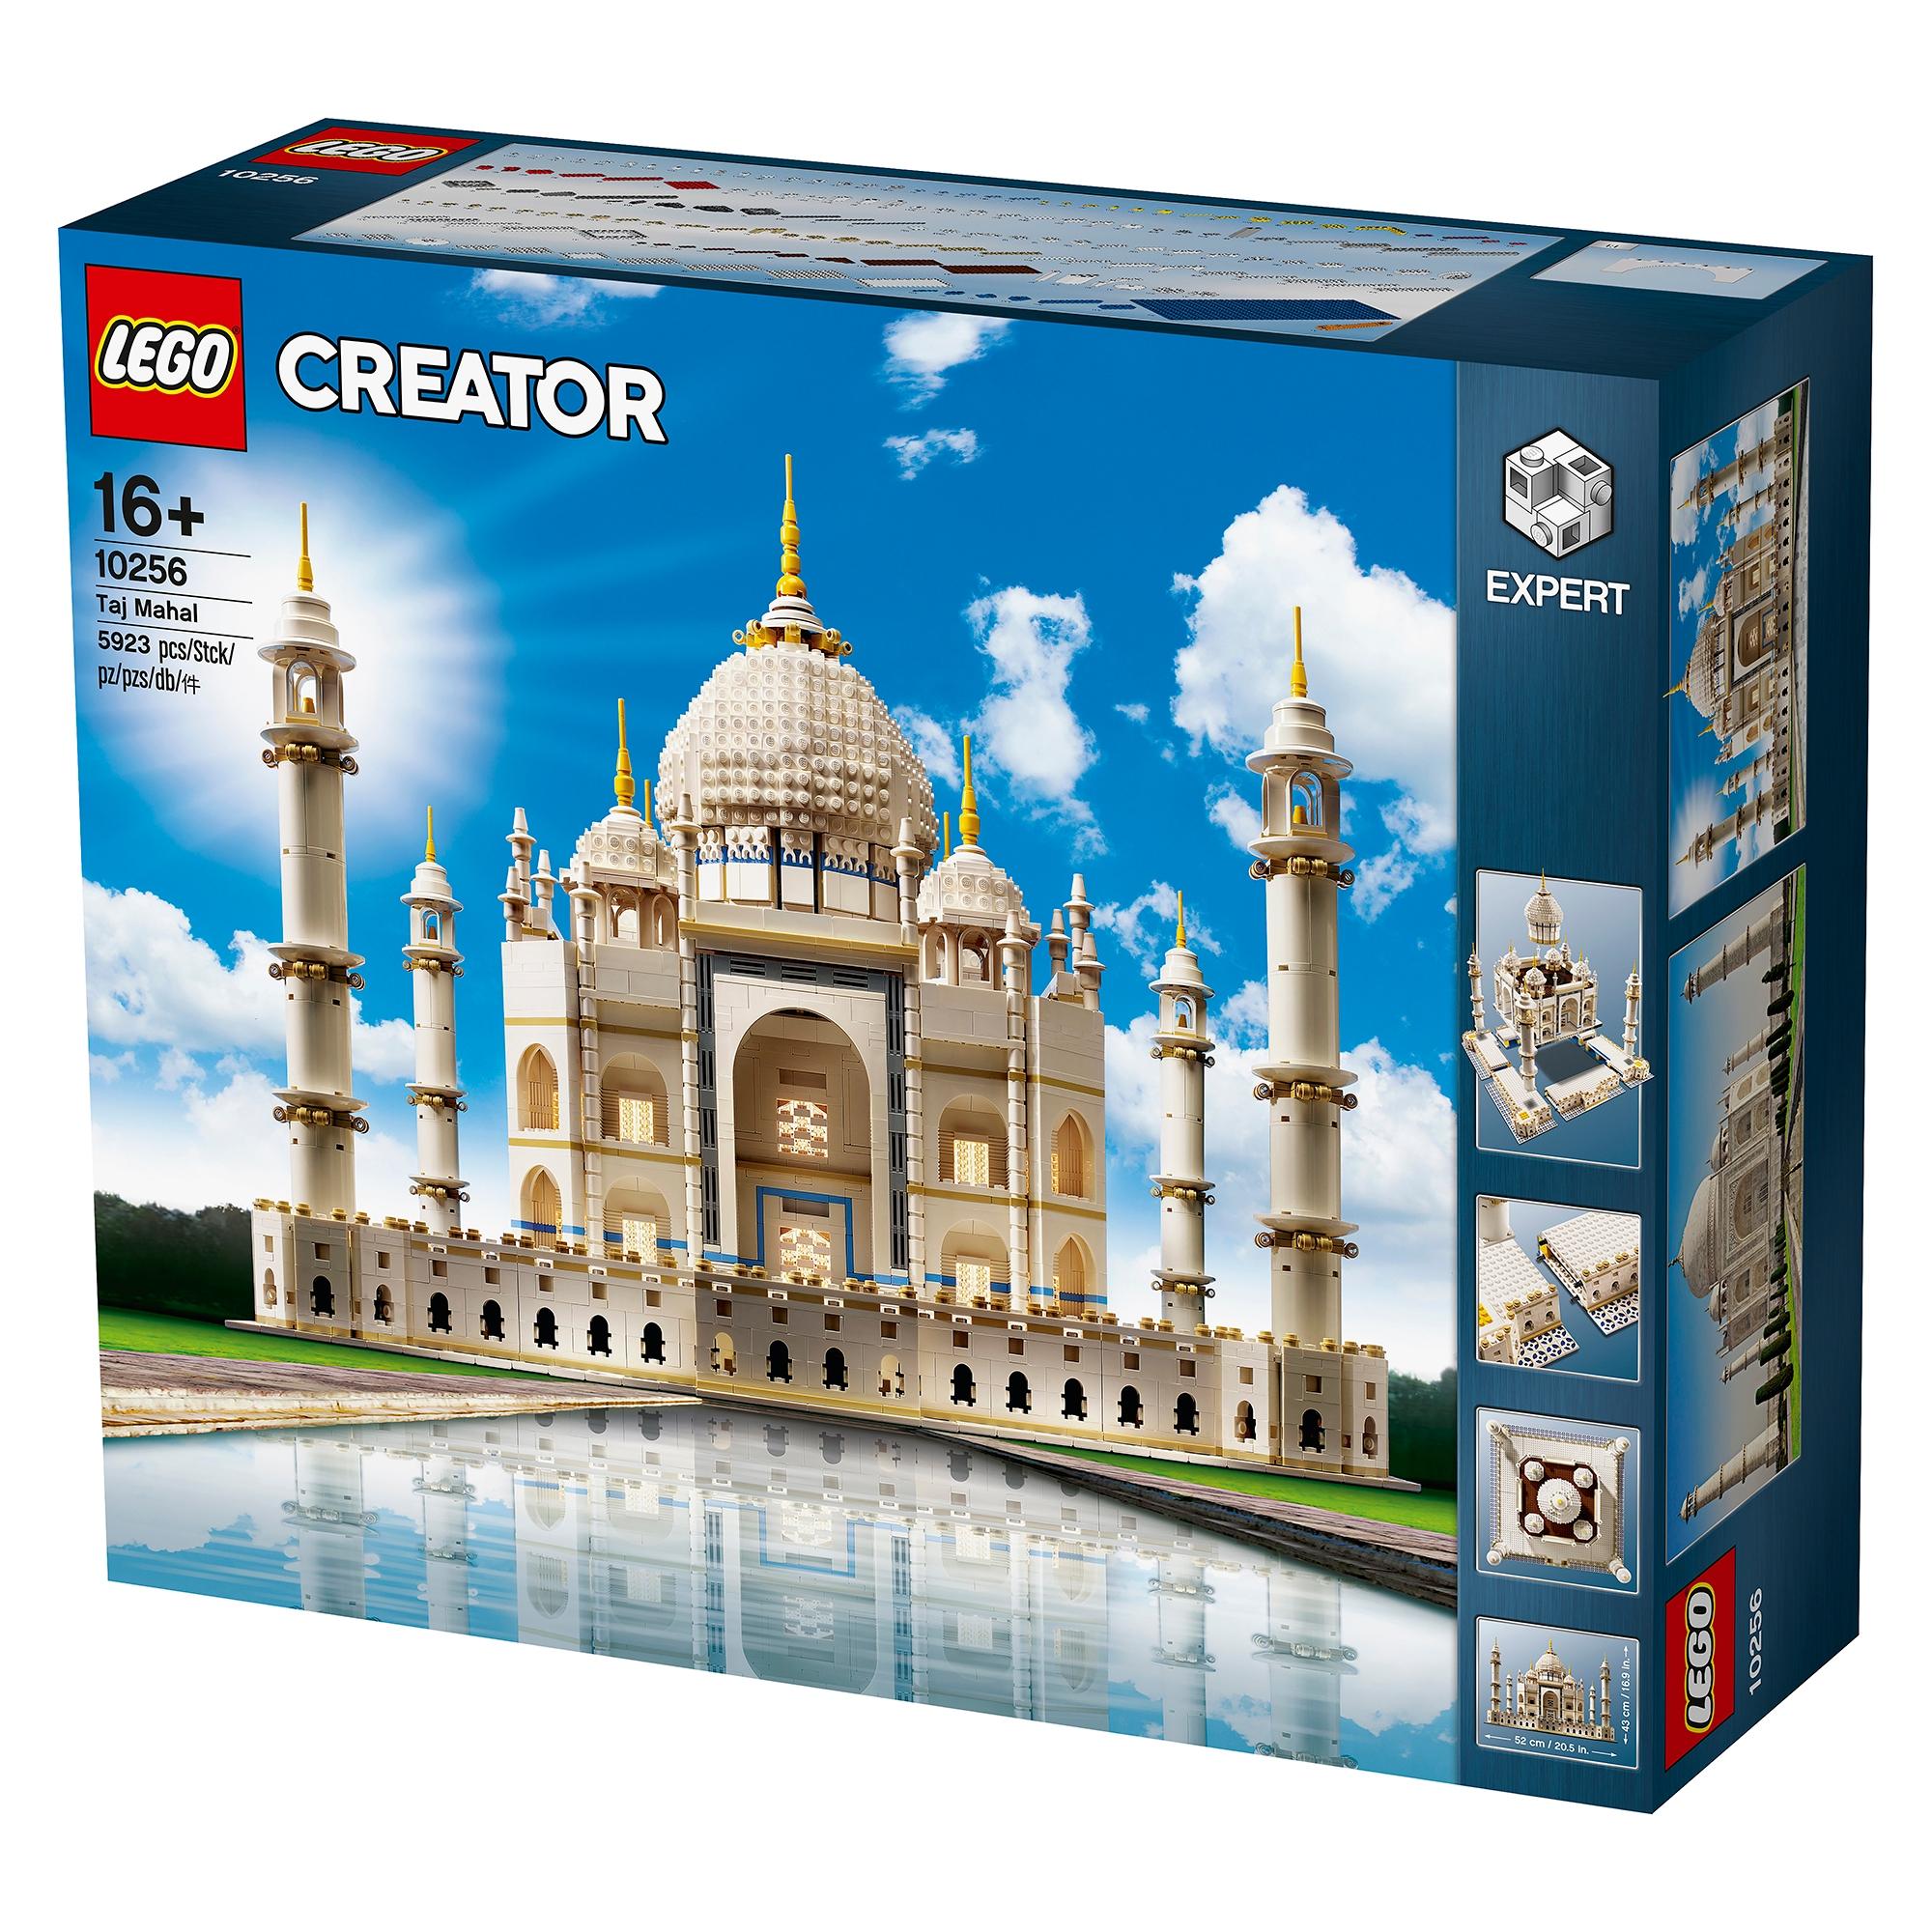 Up to 33% off LEGO incl Taj Mahal £191.99 , Technic Volvo £73.31, Star Wars Star Wars Betrayal at Cloud City £179.99 @ John Lewis & Partners